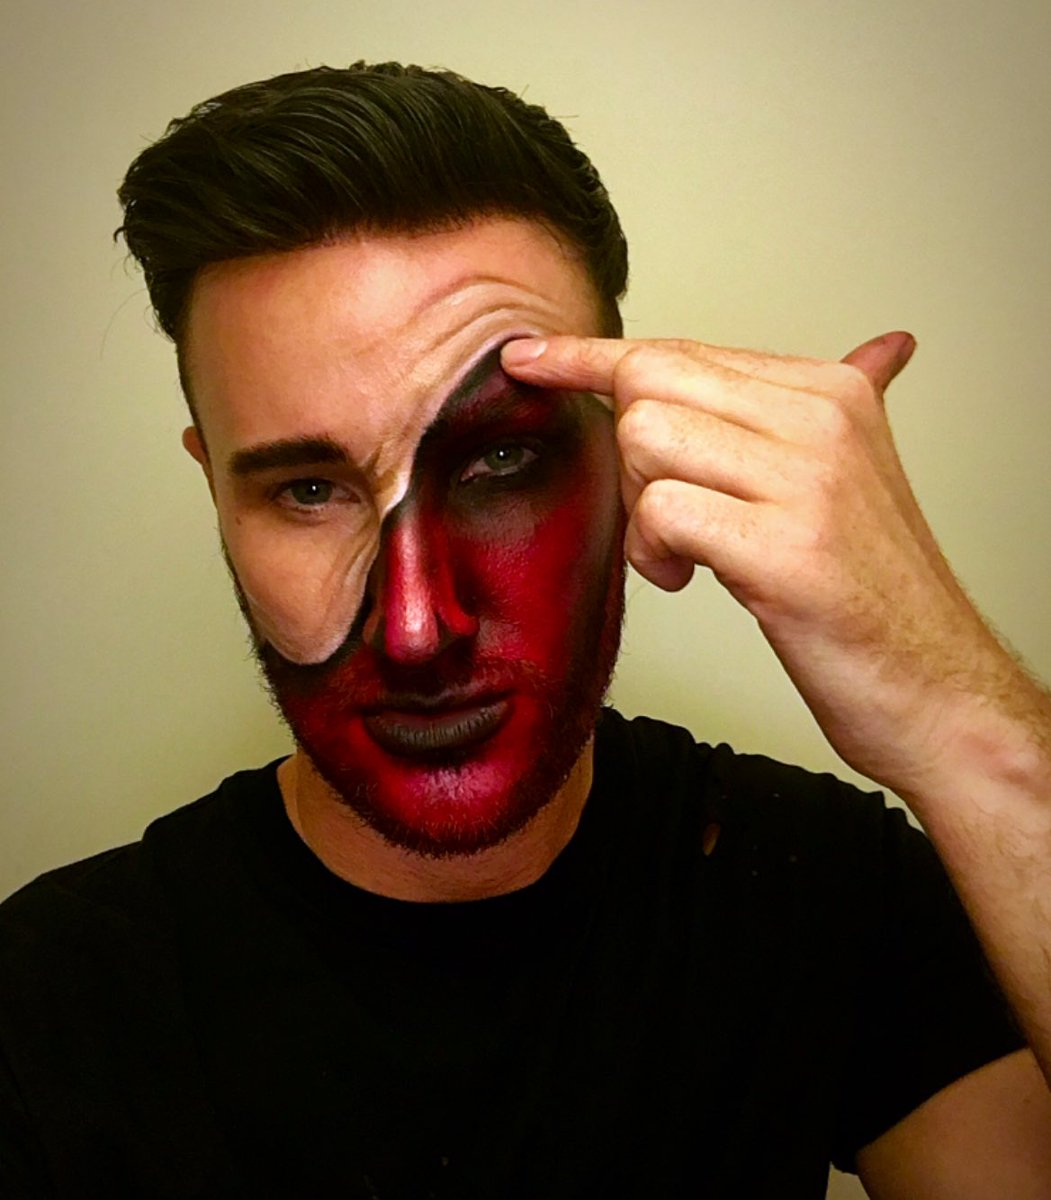 Halloween Makeup Devil.Alex Henry On Twitter The Devil Inside Halloween Makeup